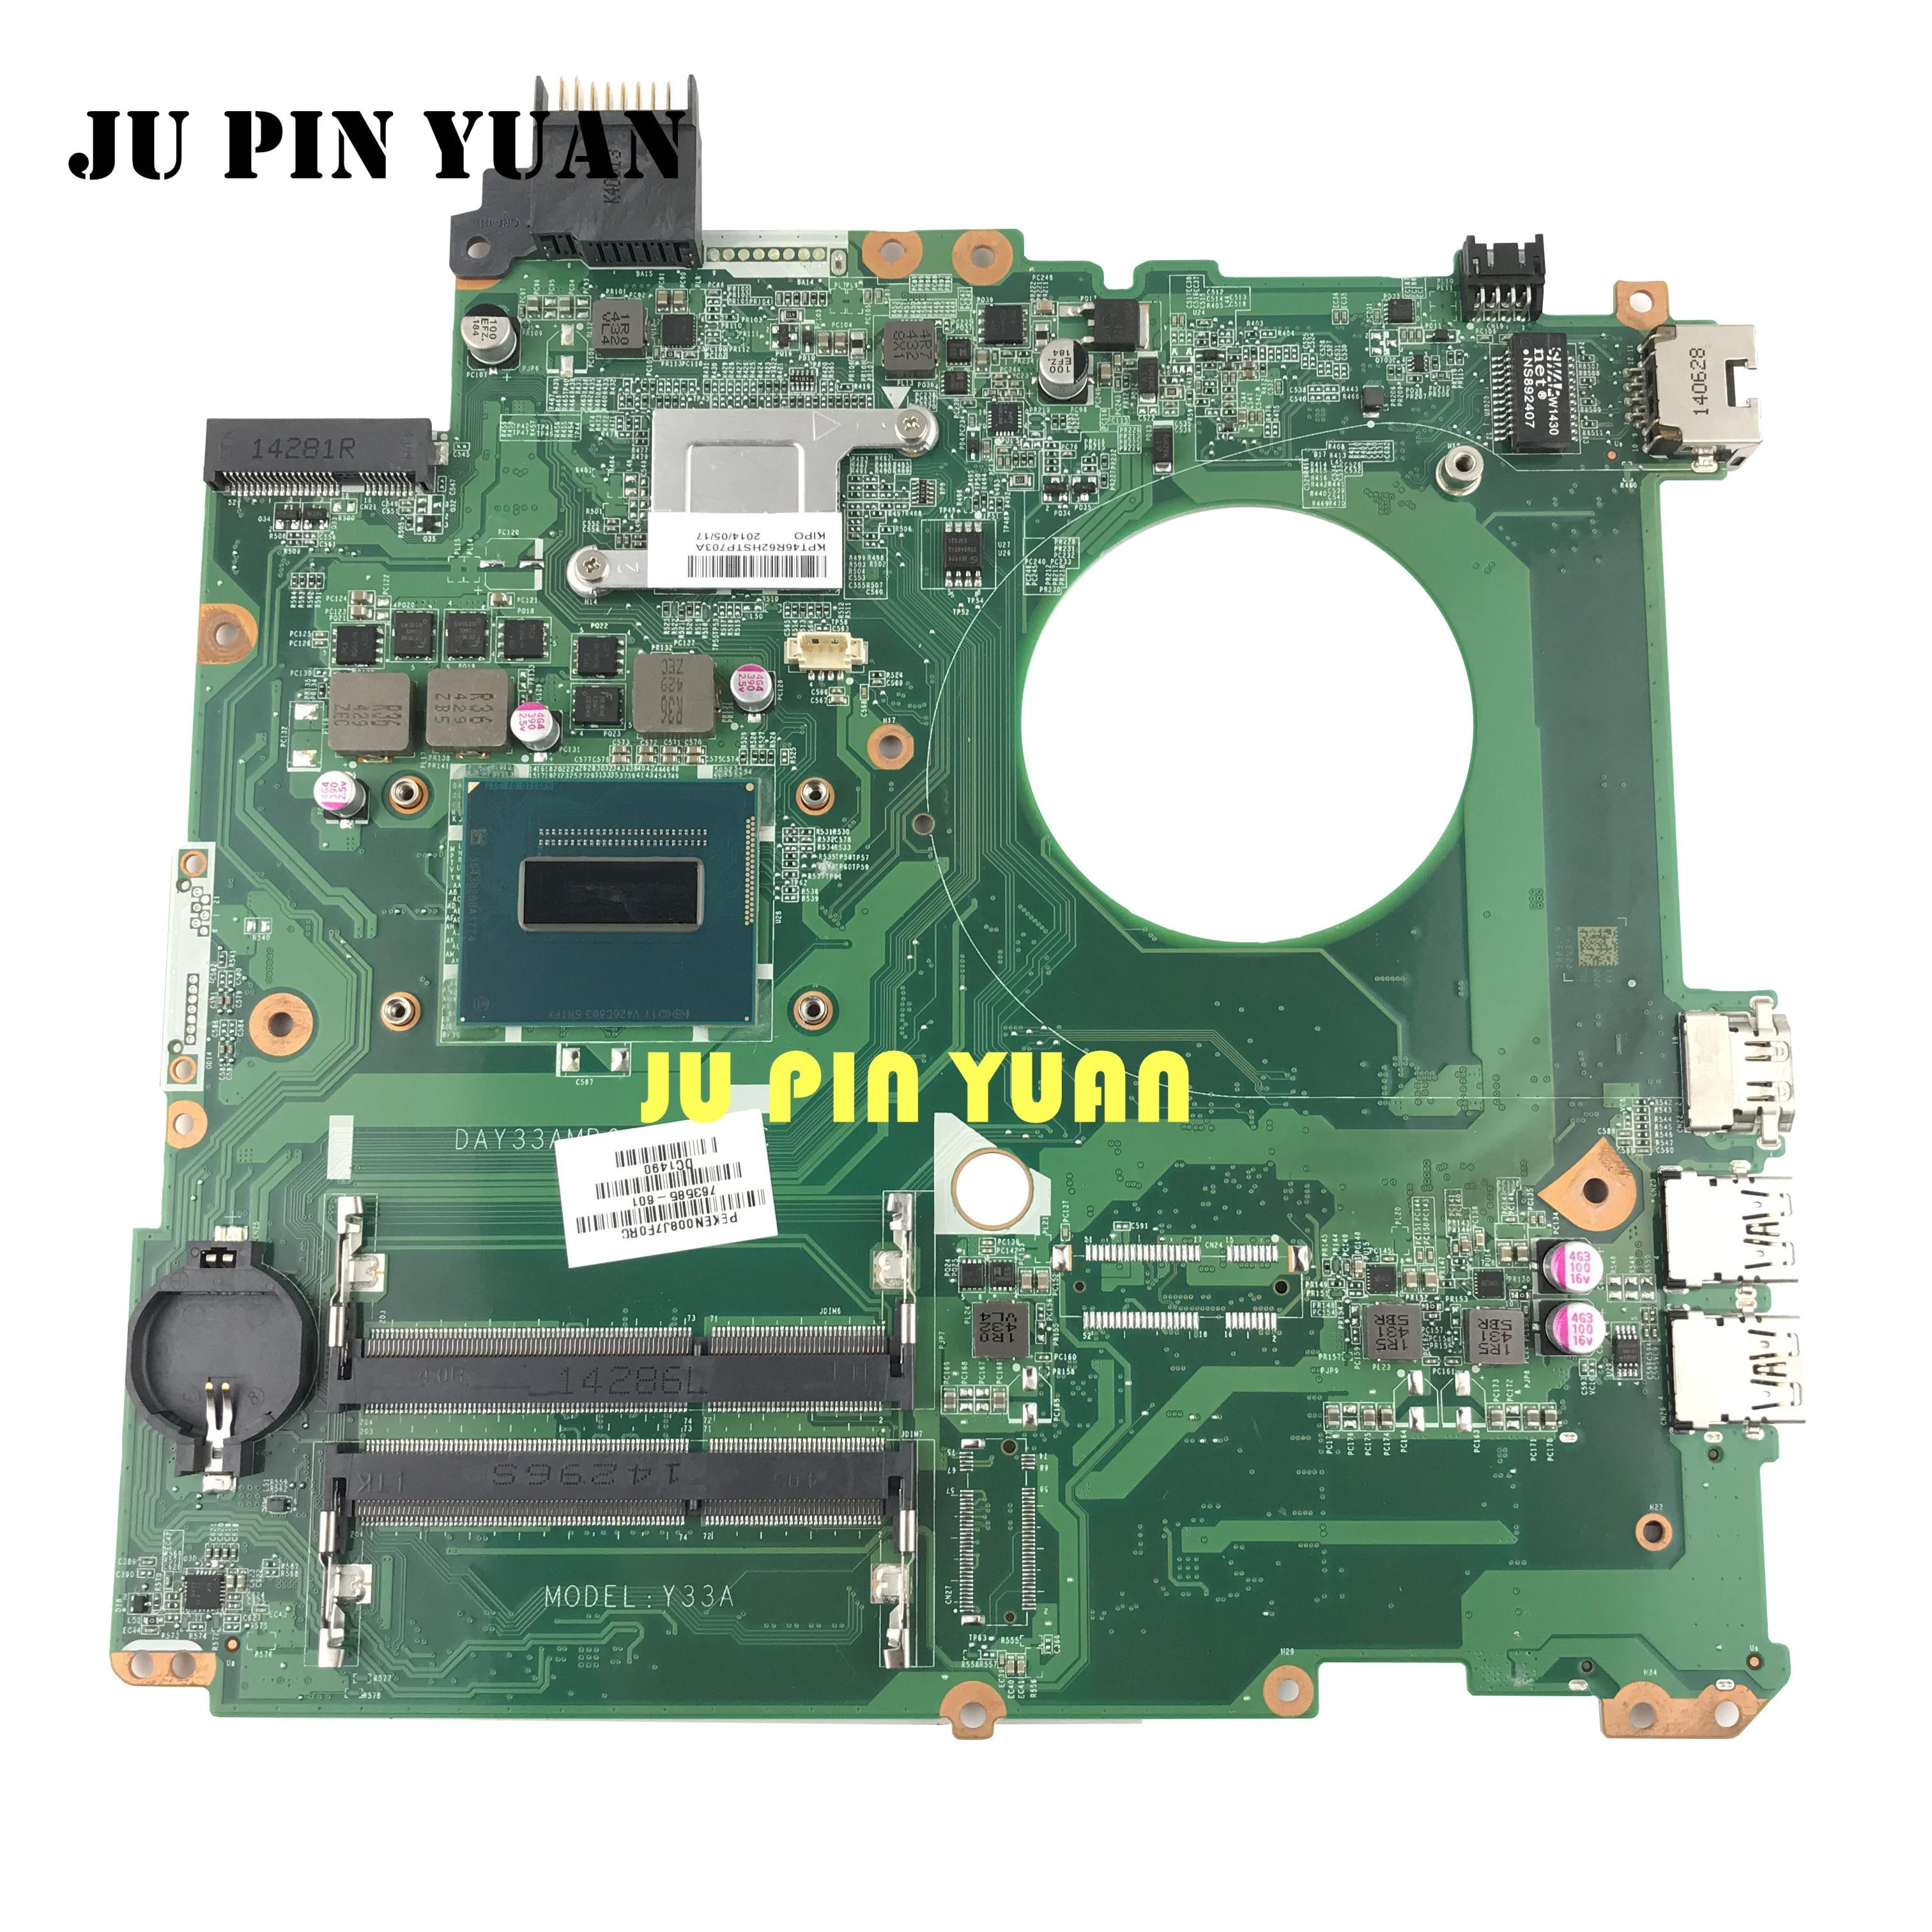 Placa base para ordenador portátil Ju pin Yuan 763585-501 Y33A para HP ENVY 15-K 763585-001 DAY33AMB6C0 con i7-4710HQ totalmente probada